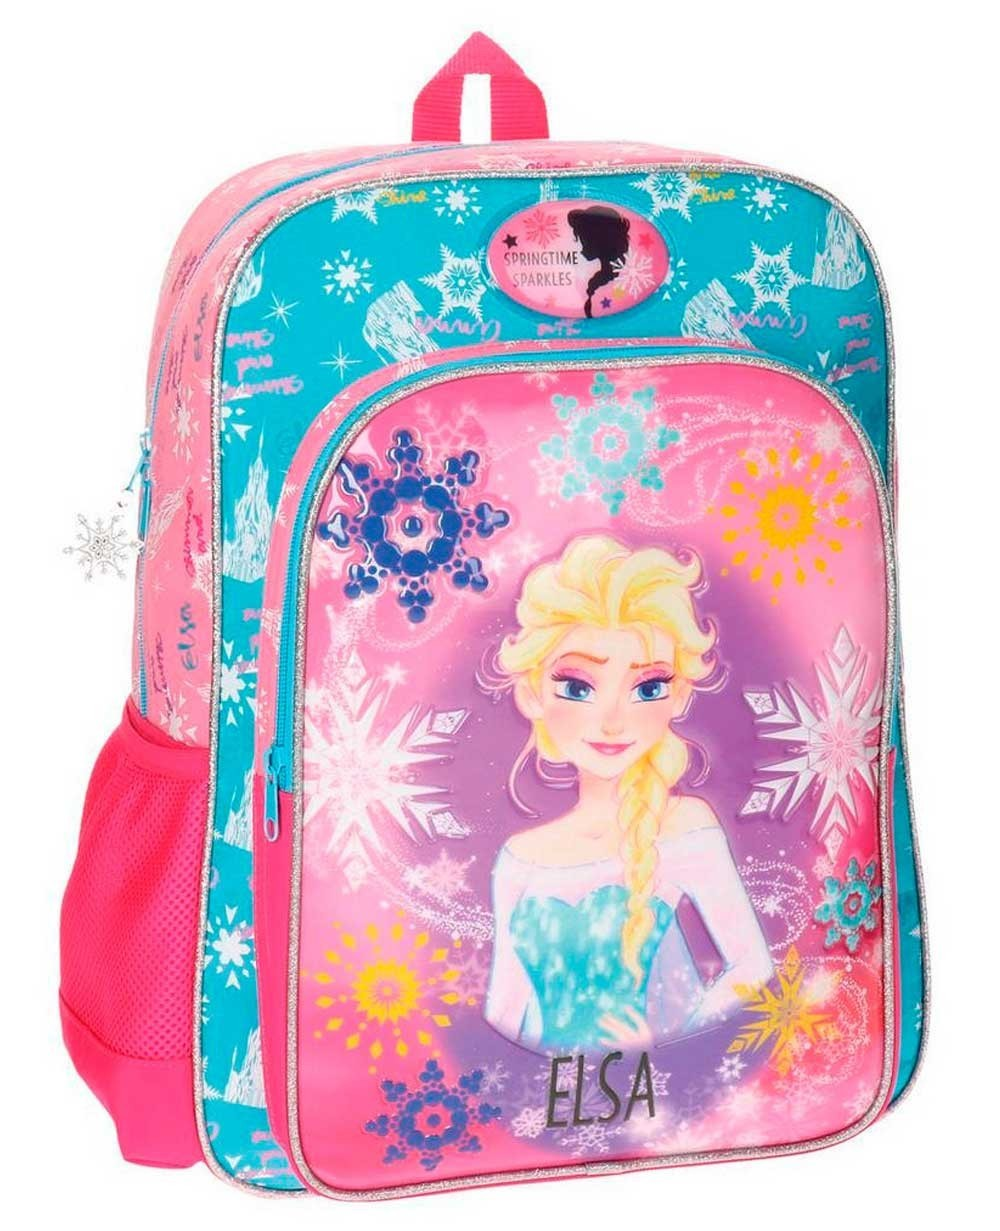 Frozen Elsa mochila adaptable Rosa (Foto )